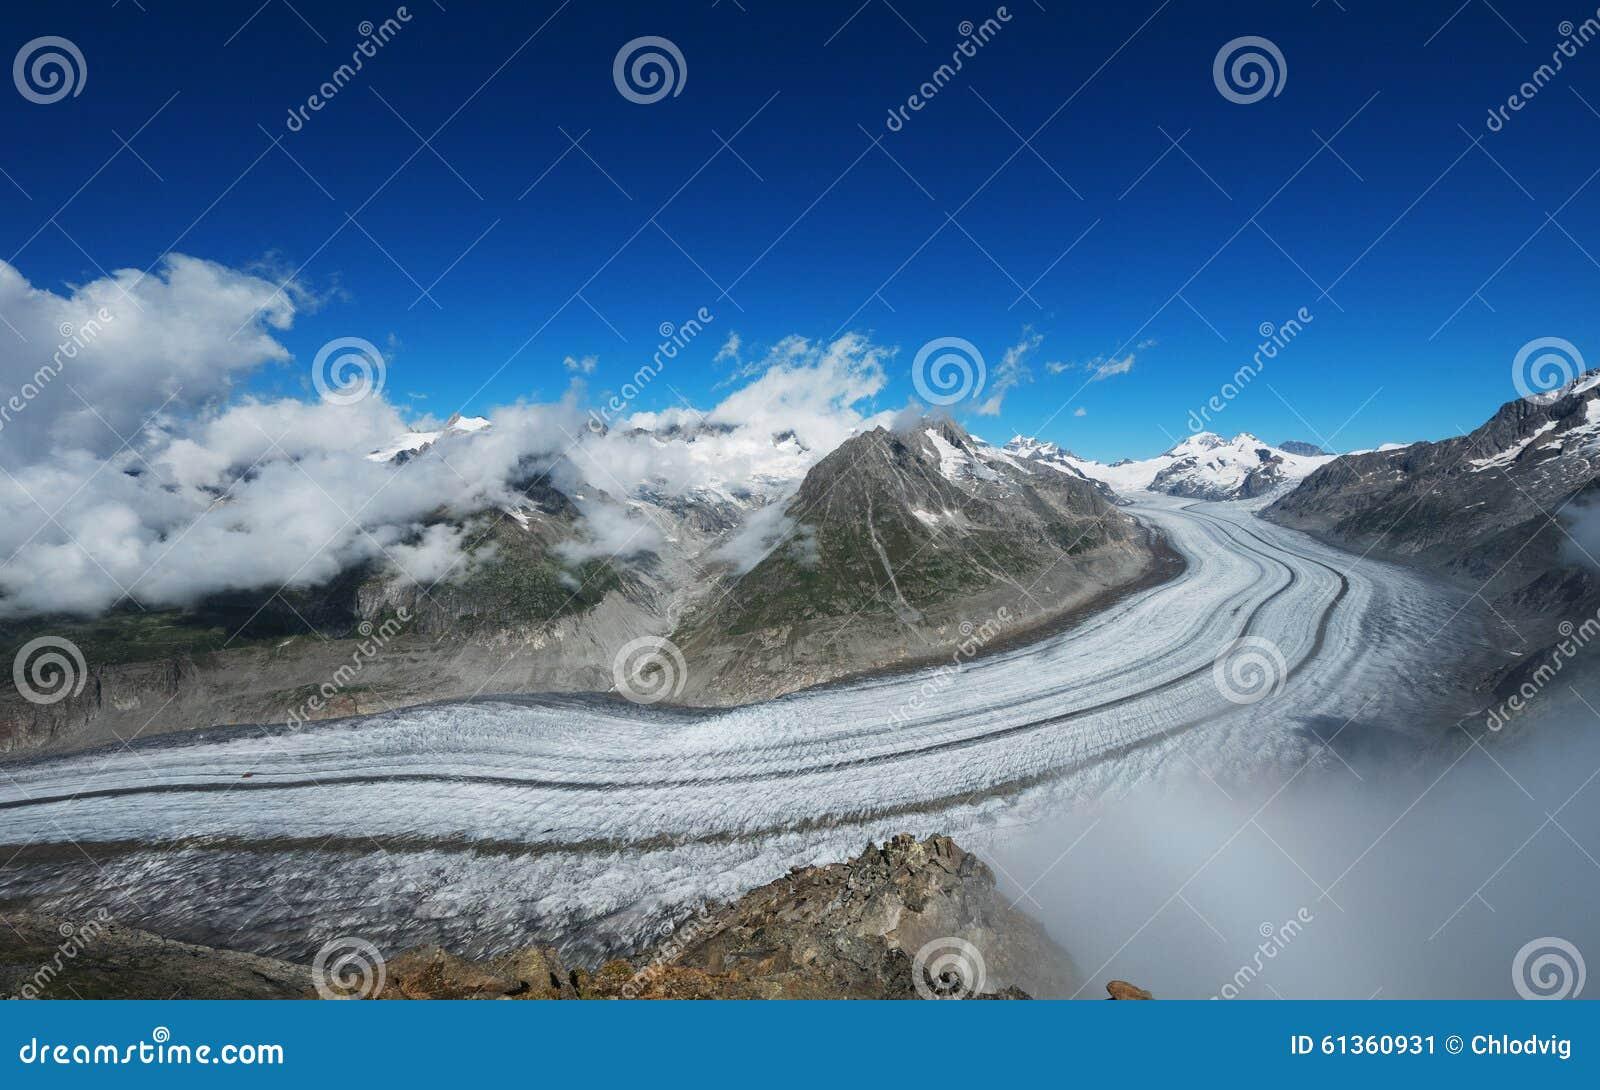 UNESCO World Heritage Site Aletsch Glacier